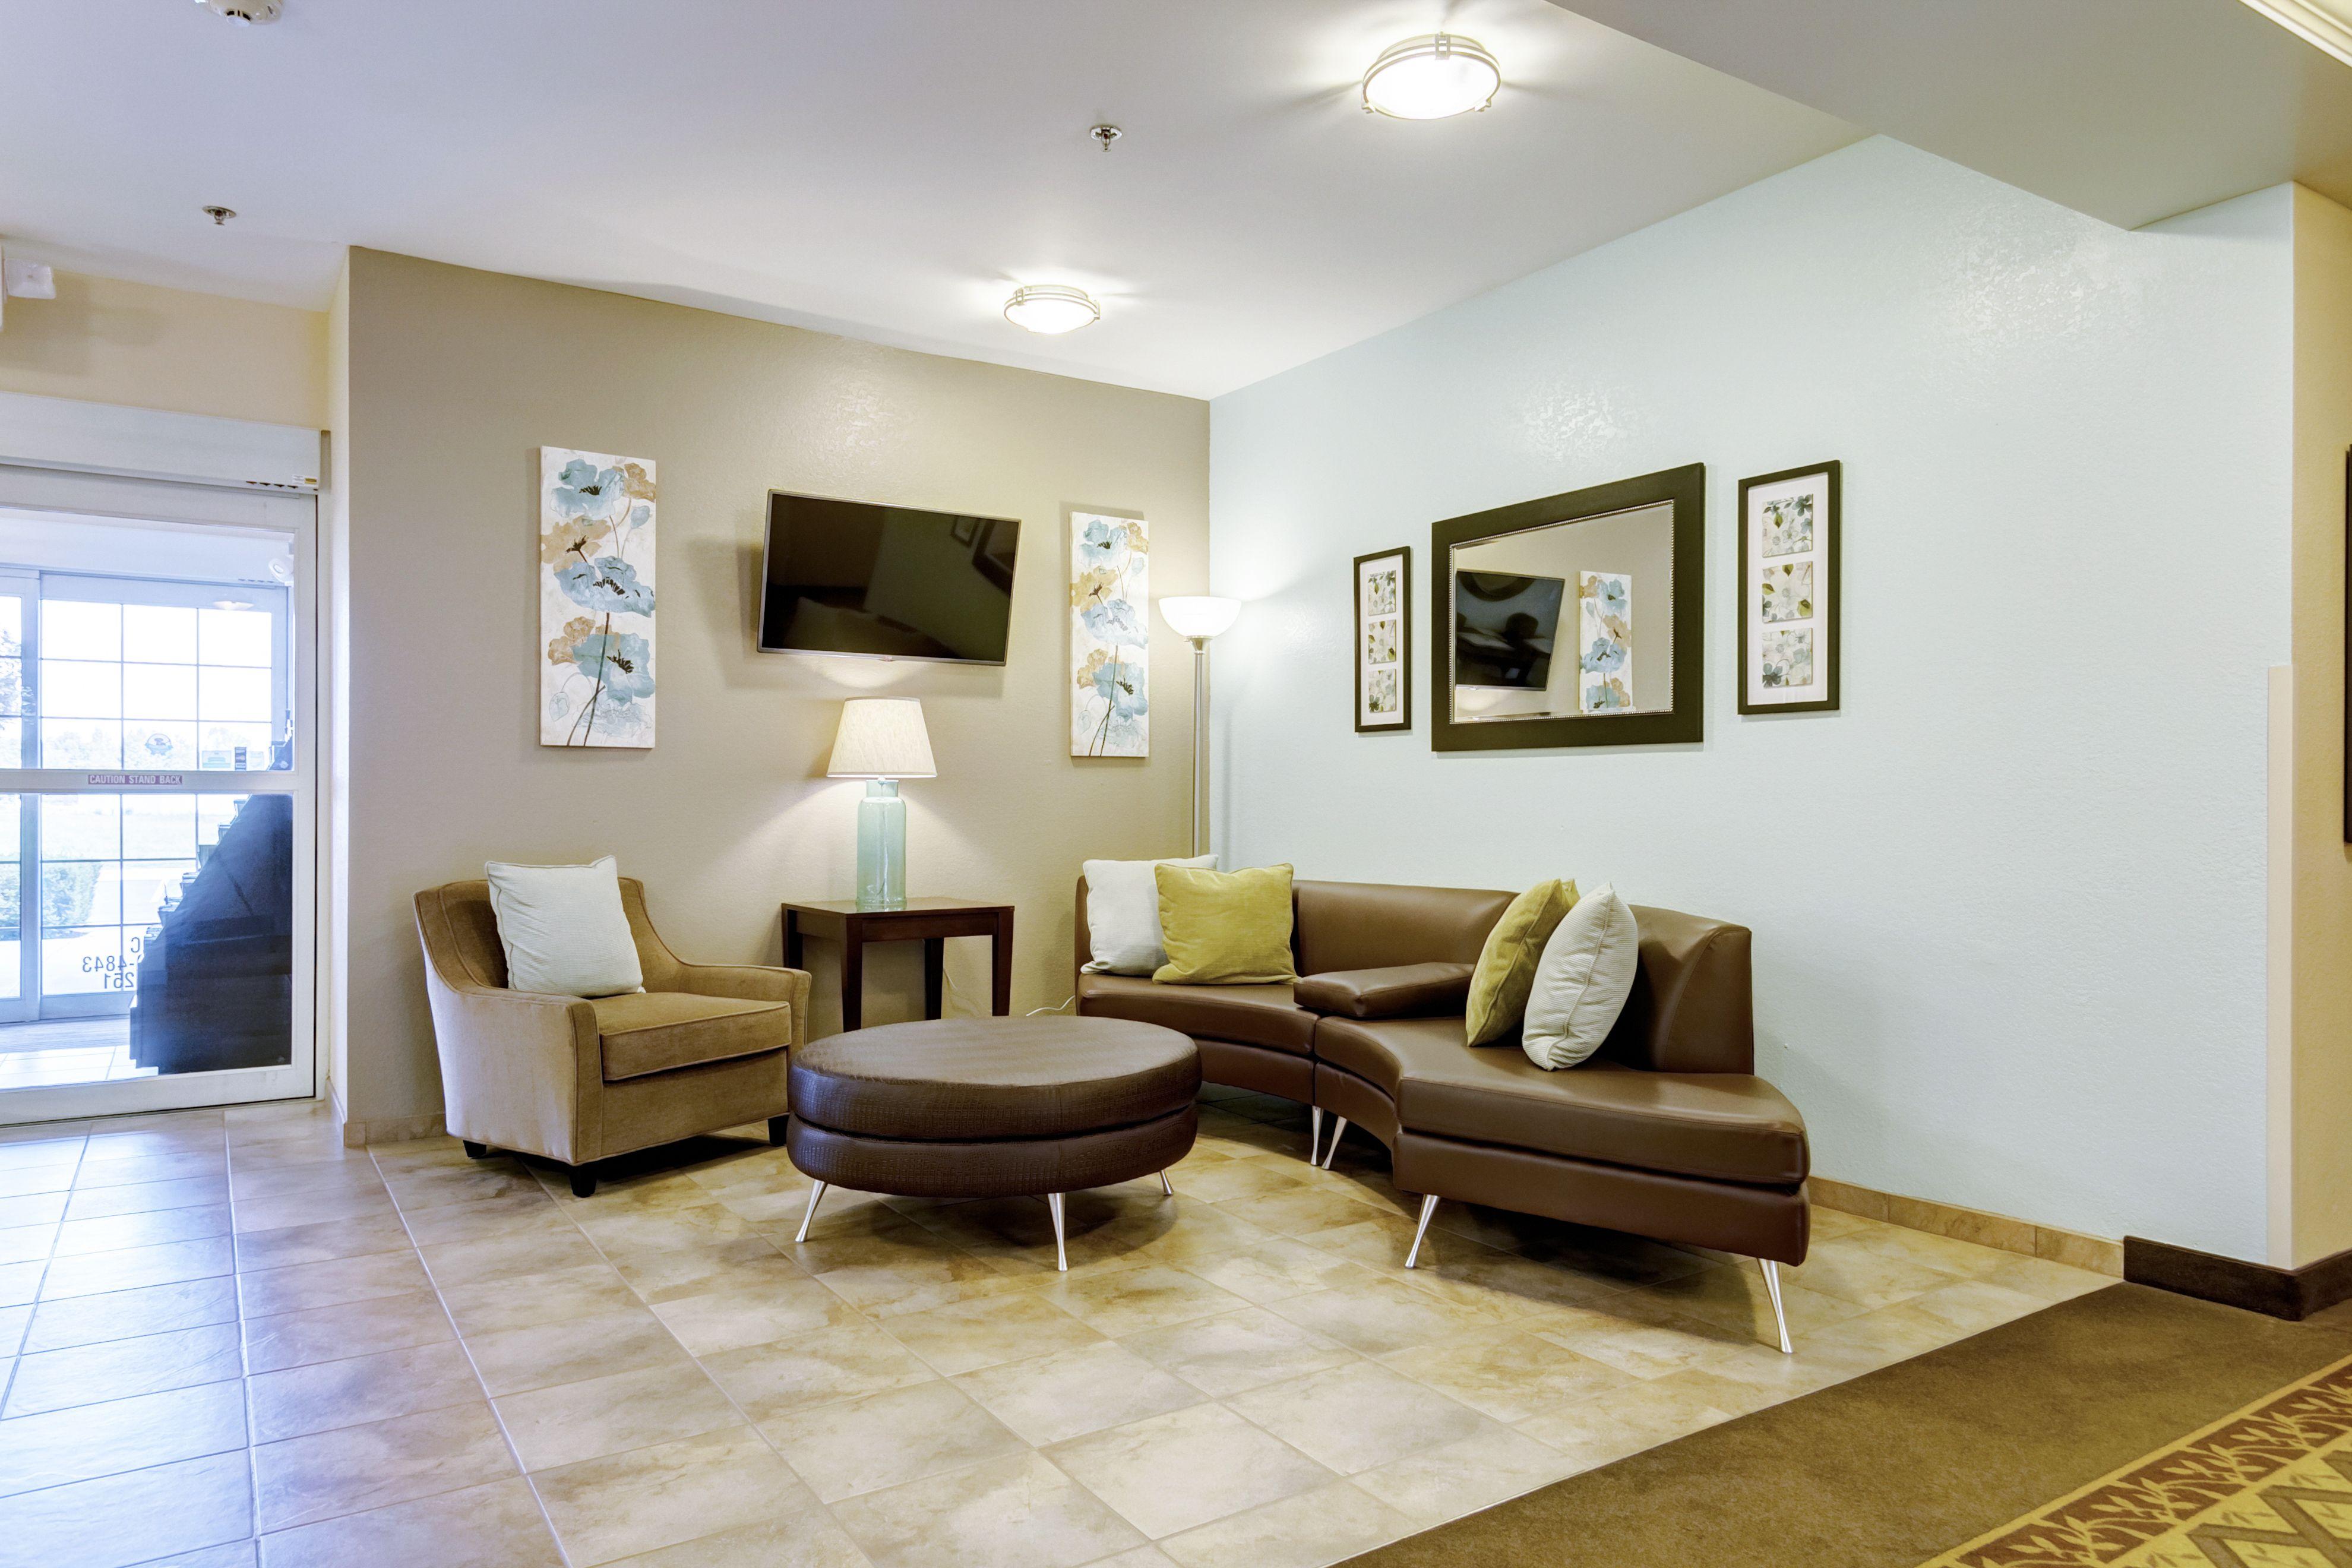 Candlewood Suites Paducah image 3